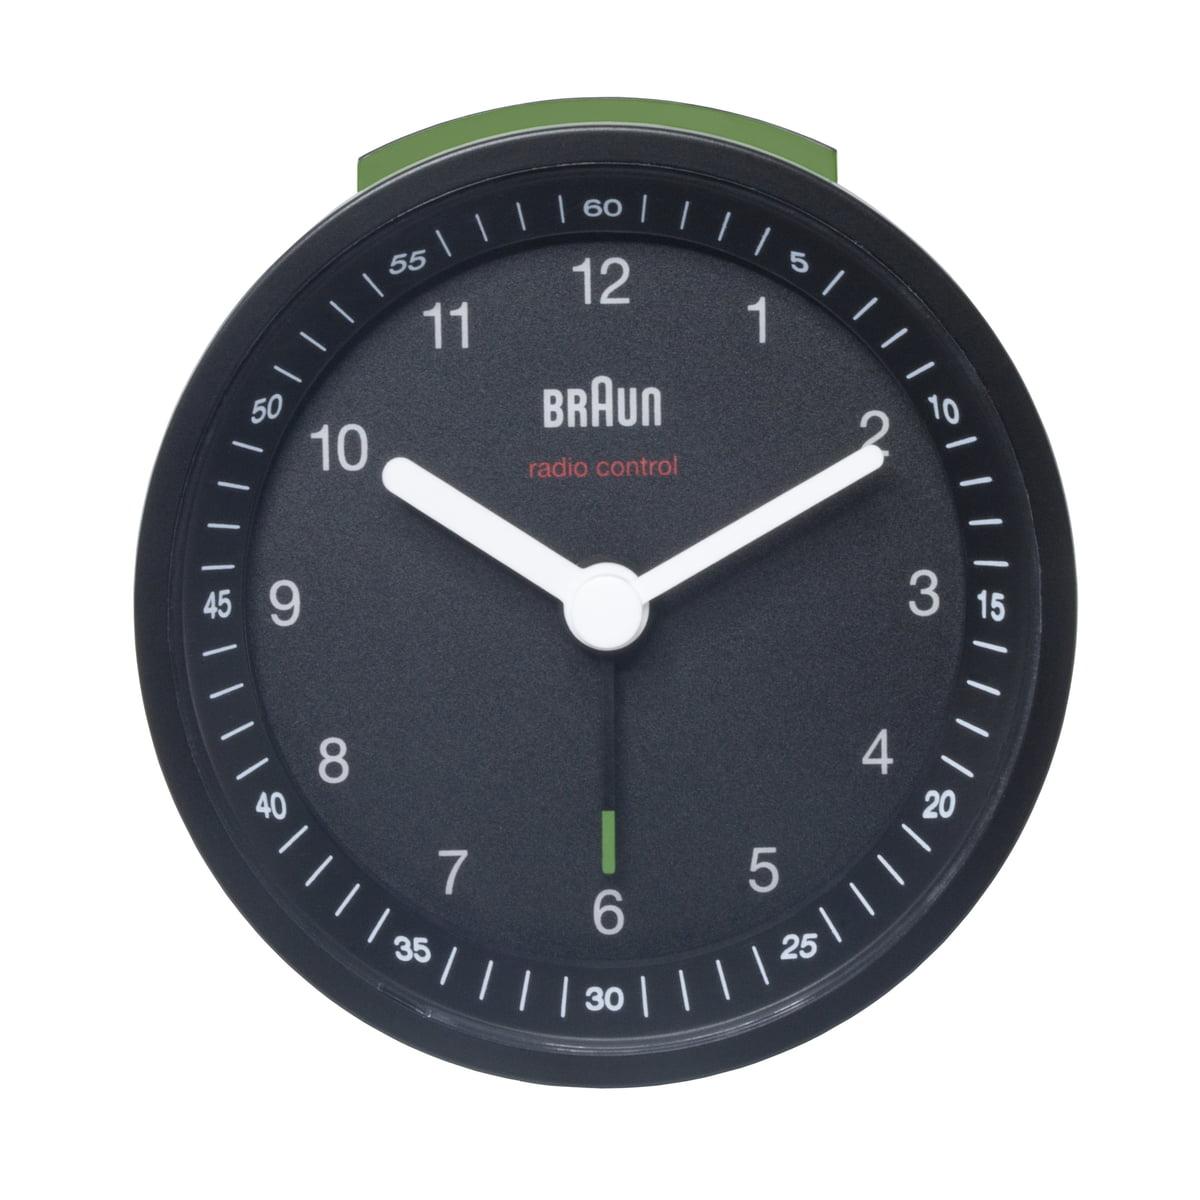 Radio controlled alarm clock bnc007 by braun braun radio controlled alarm clock bnc007 black amipublicfo Gallery